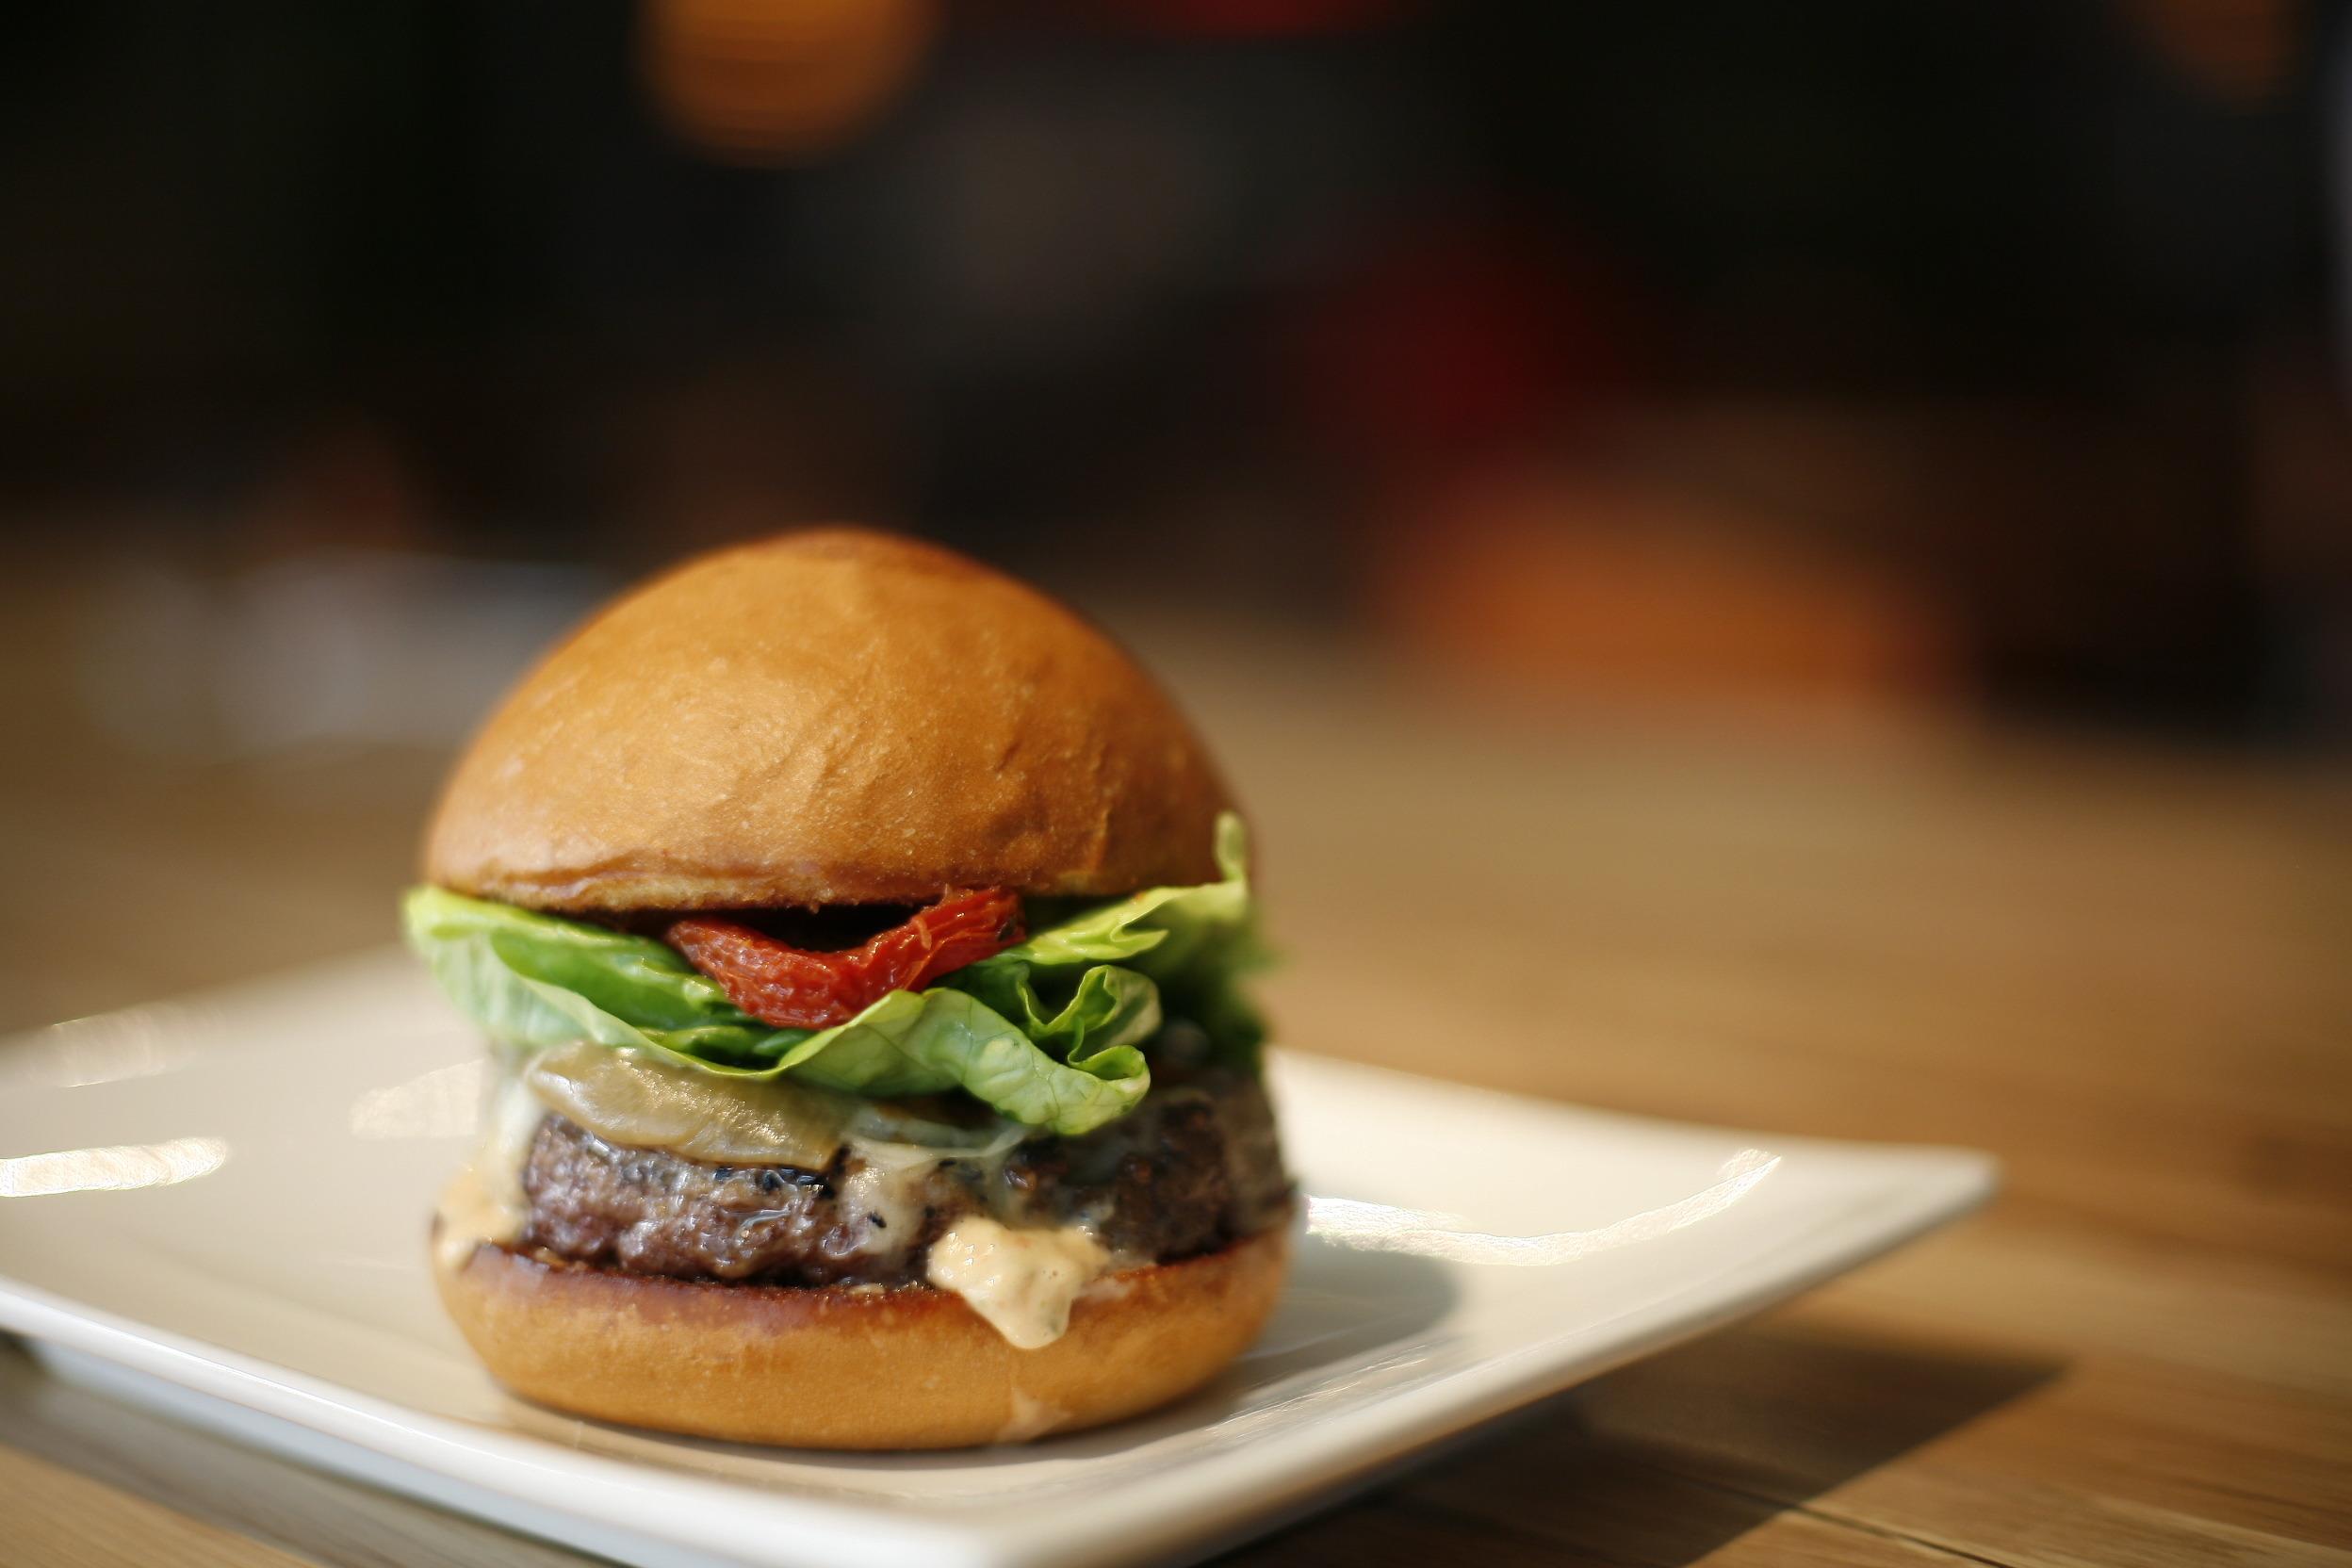 We're getting an Umami Burger!